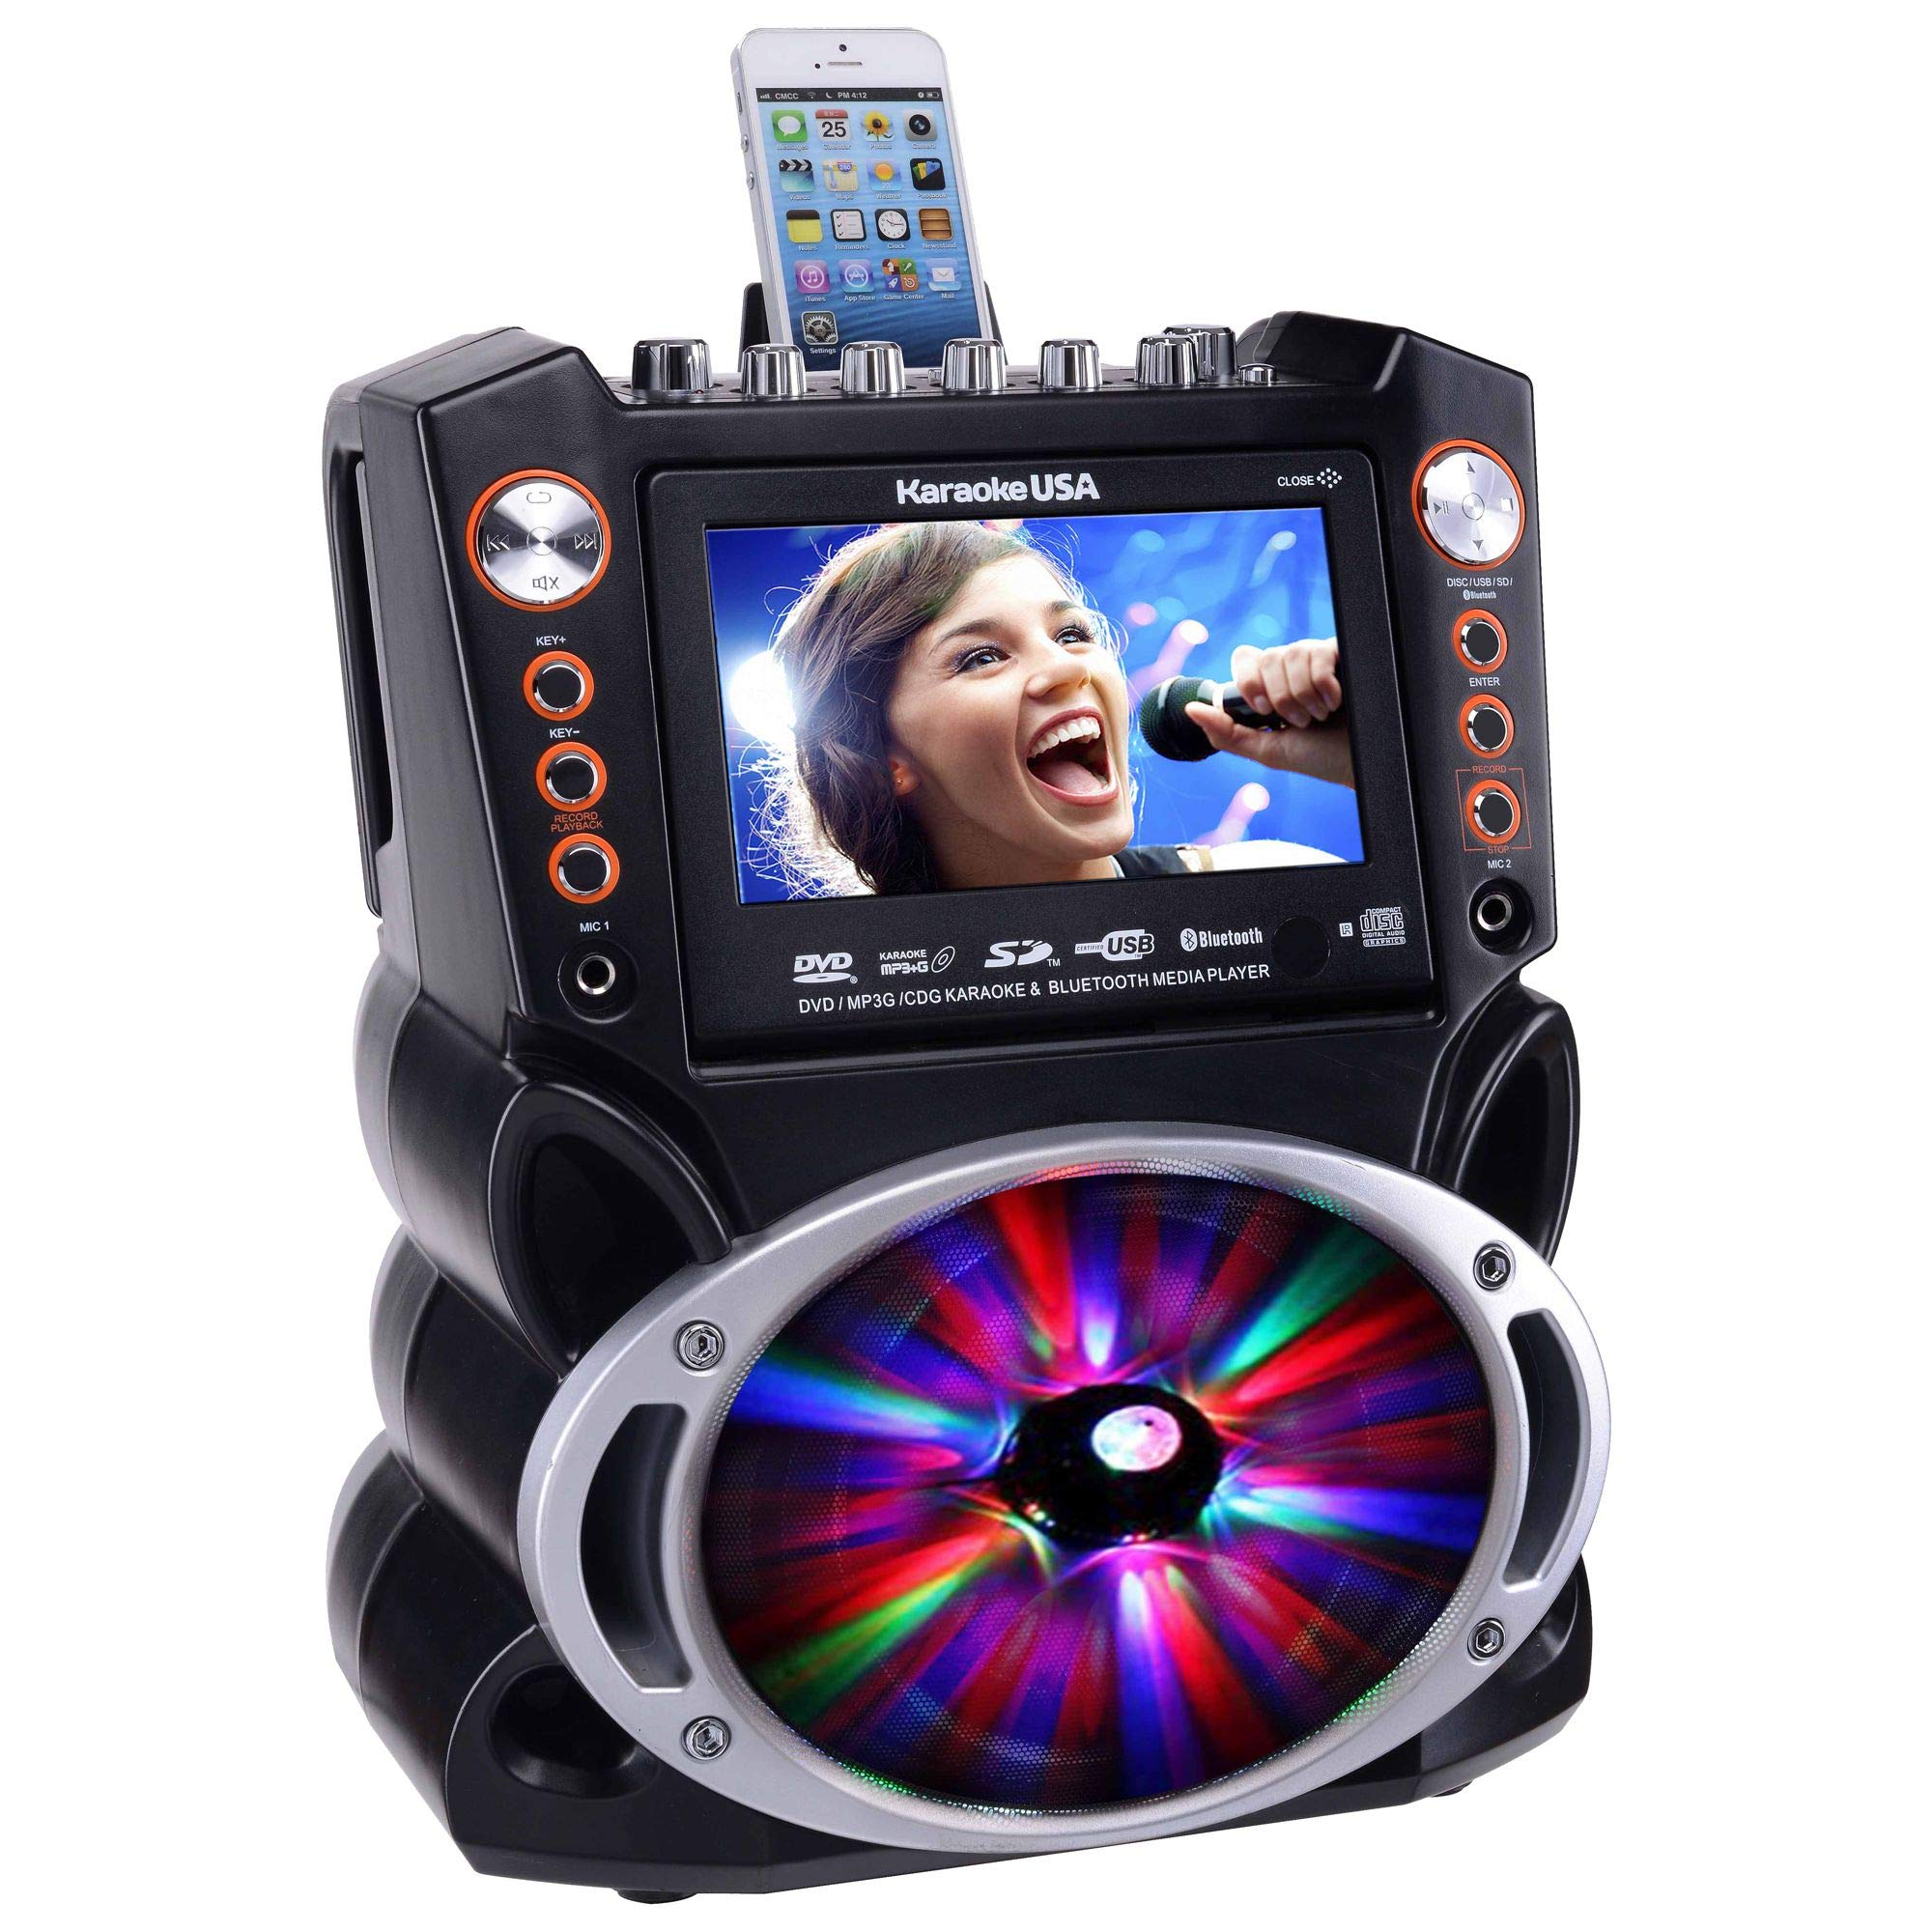 Karaoke USA GF846 DVD/CDG/MP3G Karaoke Machine with 7'' TFT Color Screen, Record, Bluetooth and LED Sync Lights by Karaoke USA (Image #4)